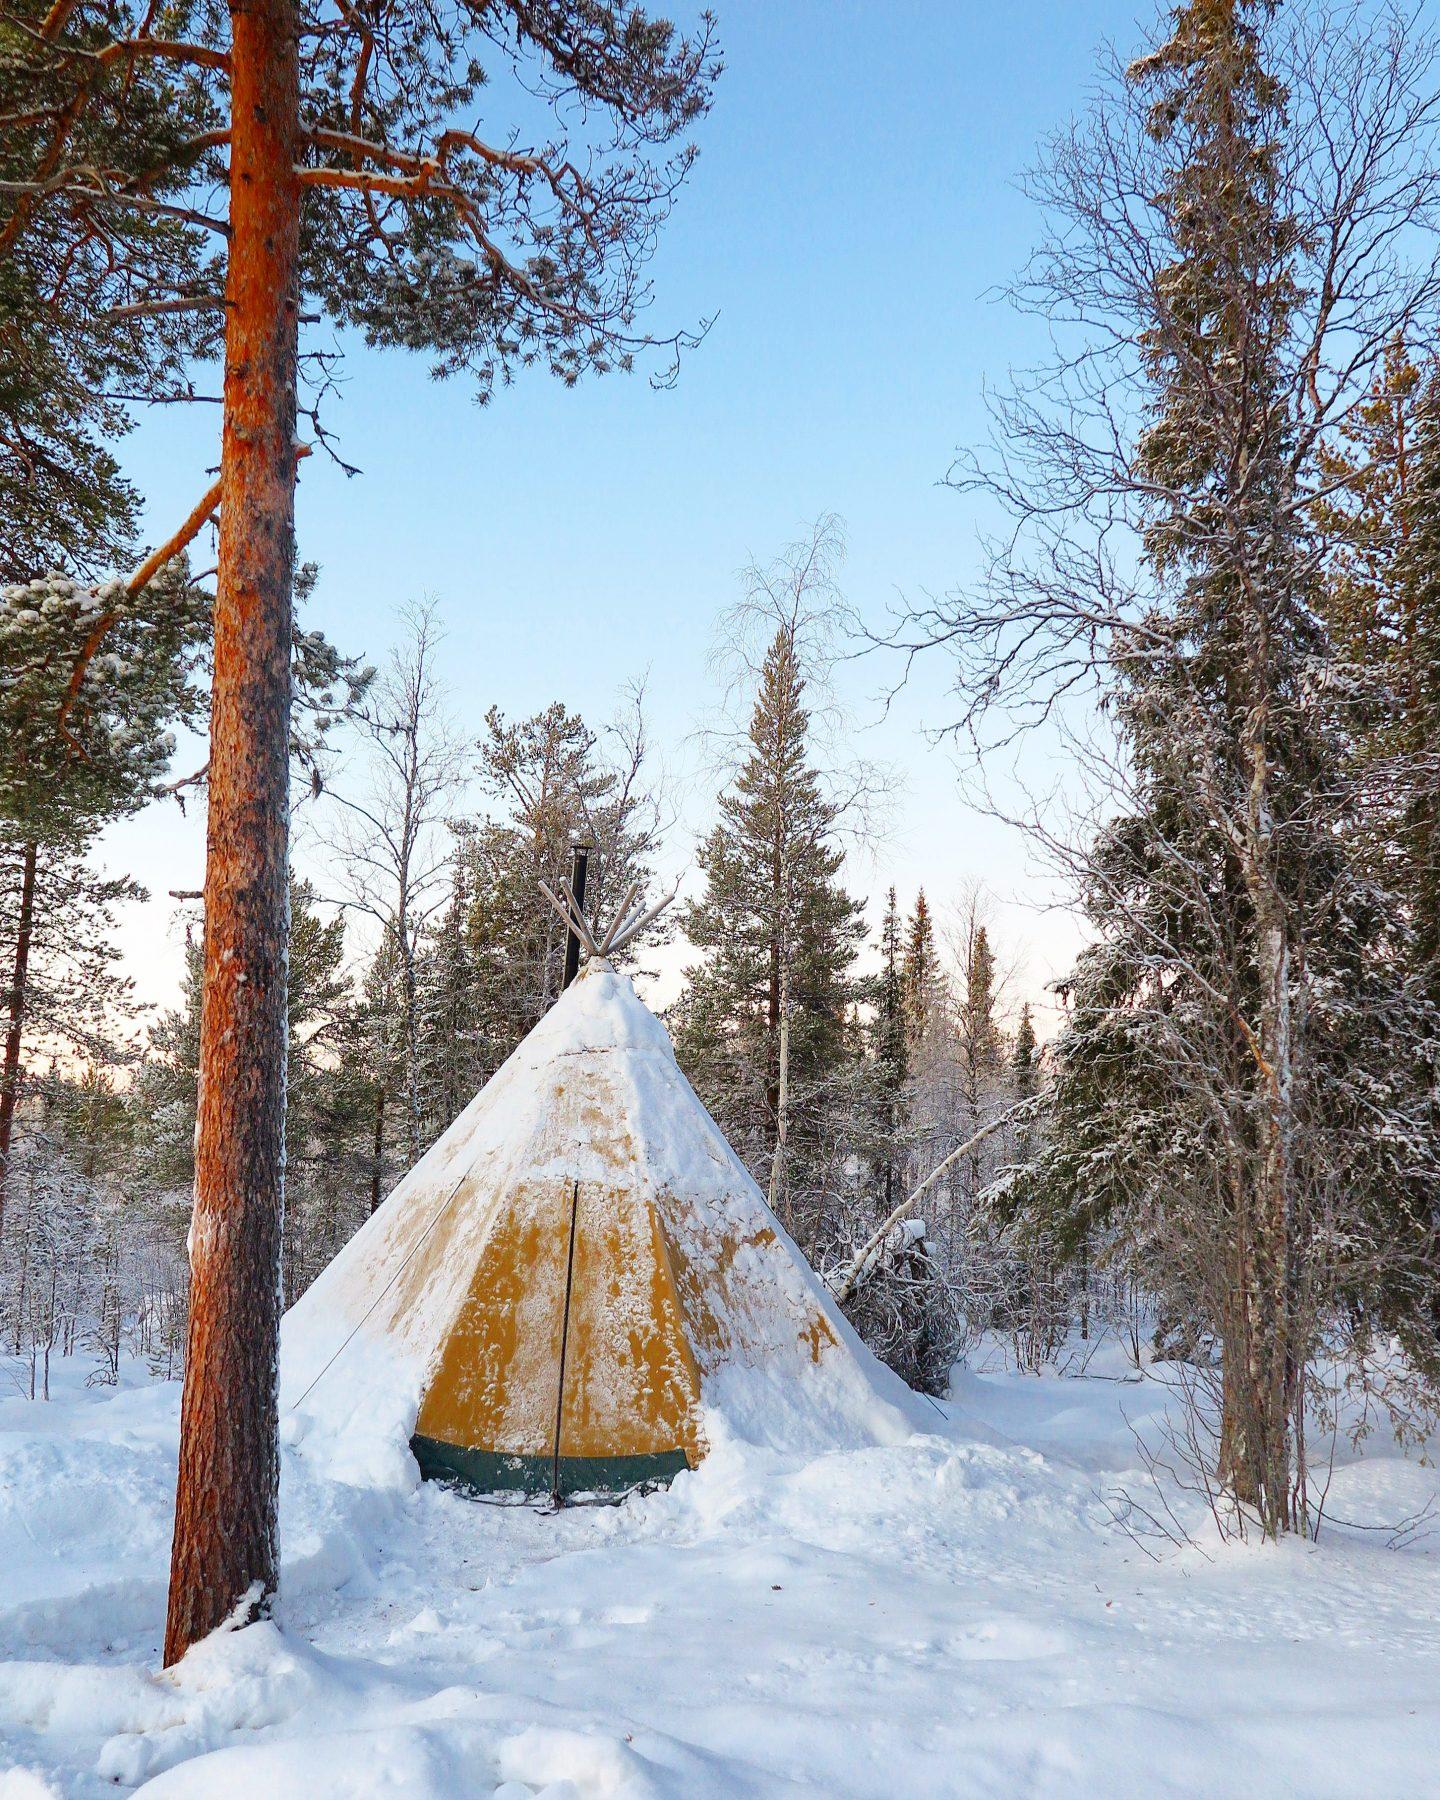 SWEDISH LAPLAND – A PHOTO DIARY